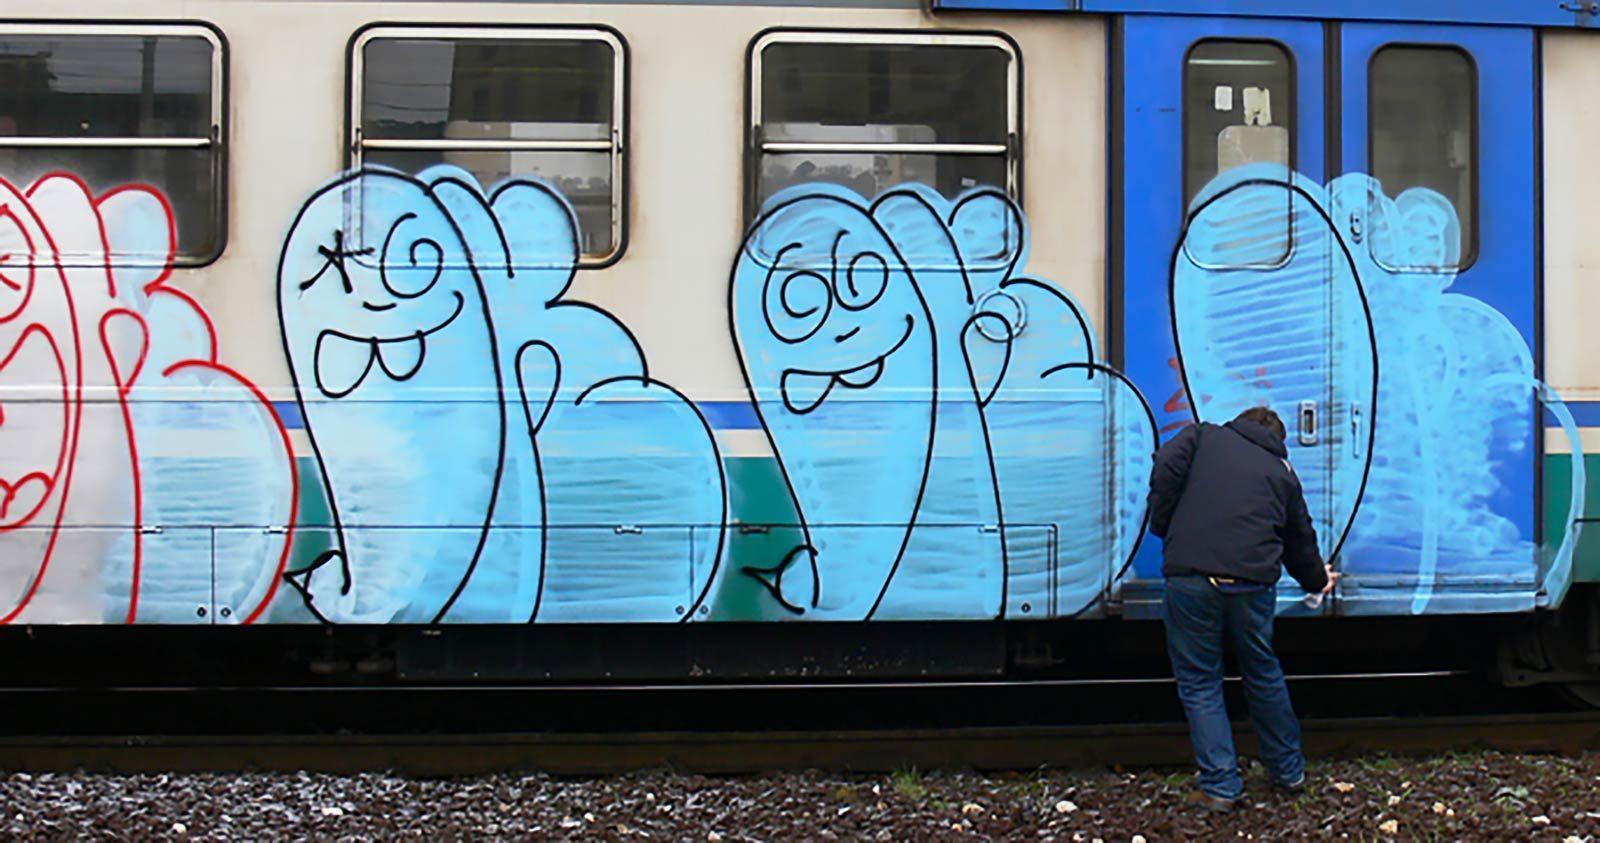 Rave party, graffiti, prison: rencontre avec Oker